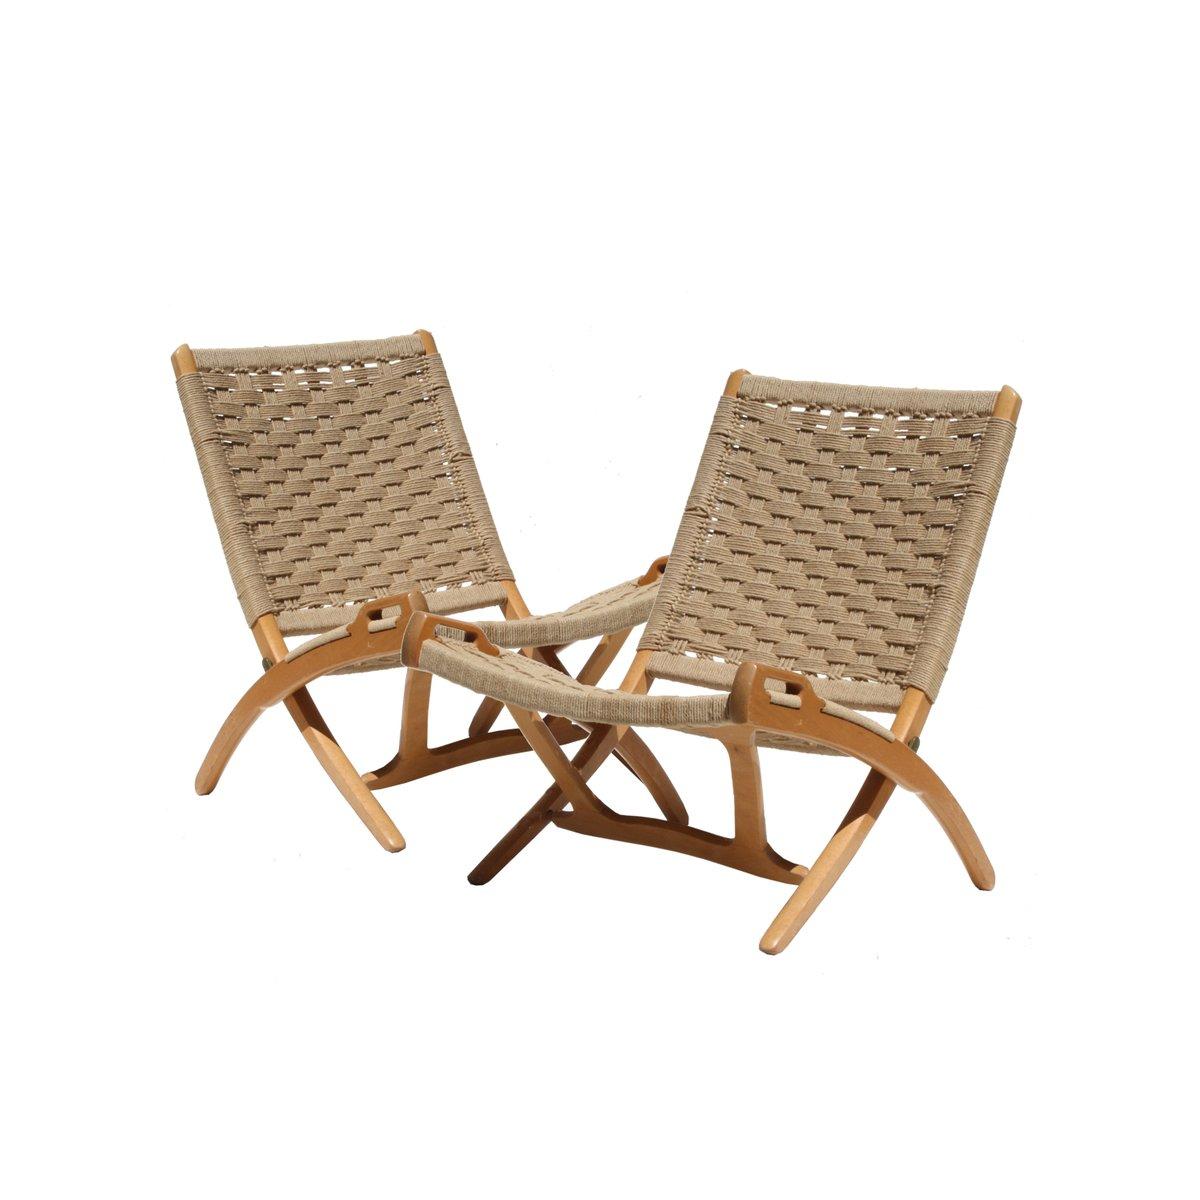 Danish Mid Century Oak U0026 Natural Fiber Folding Chairs, Set Of 2